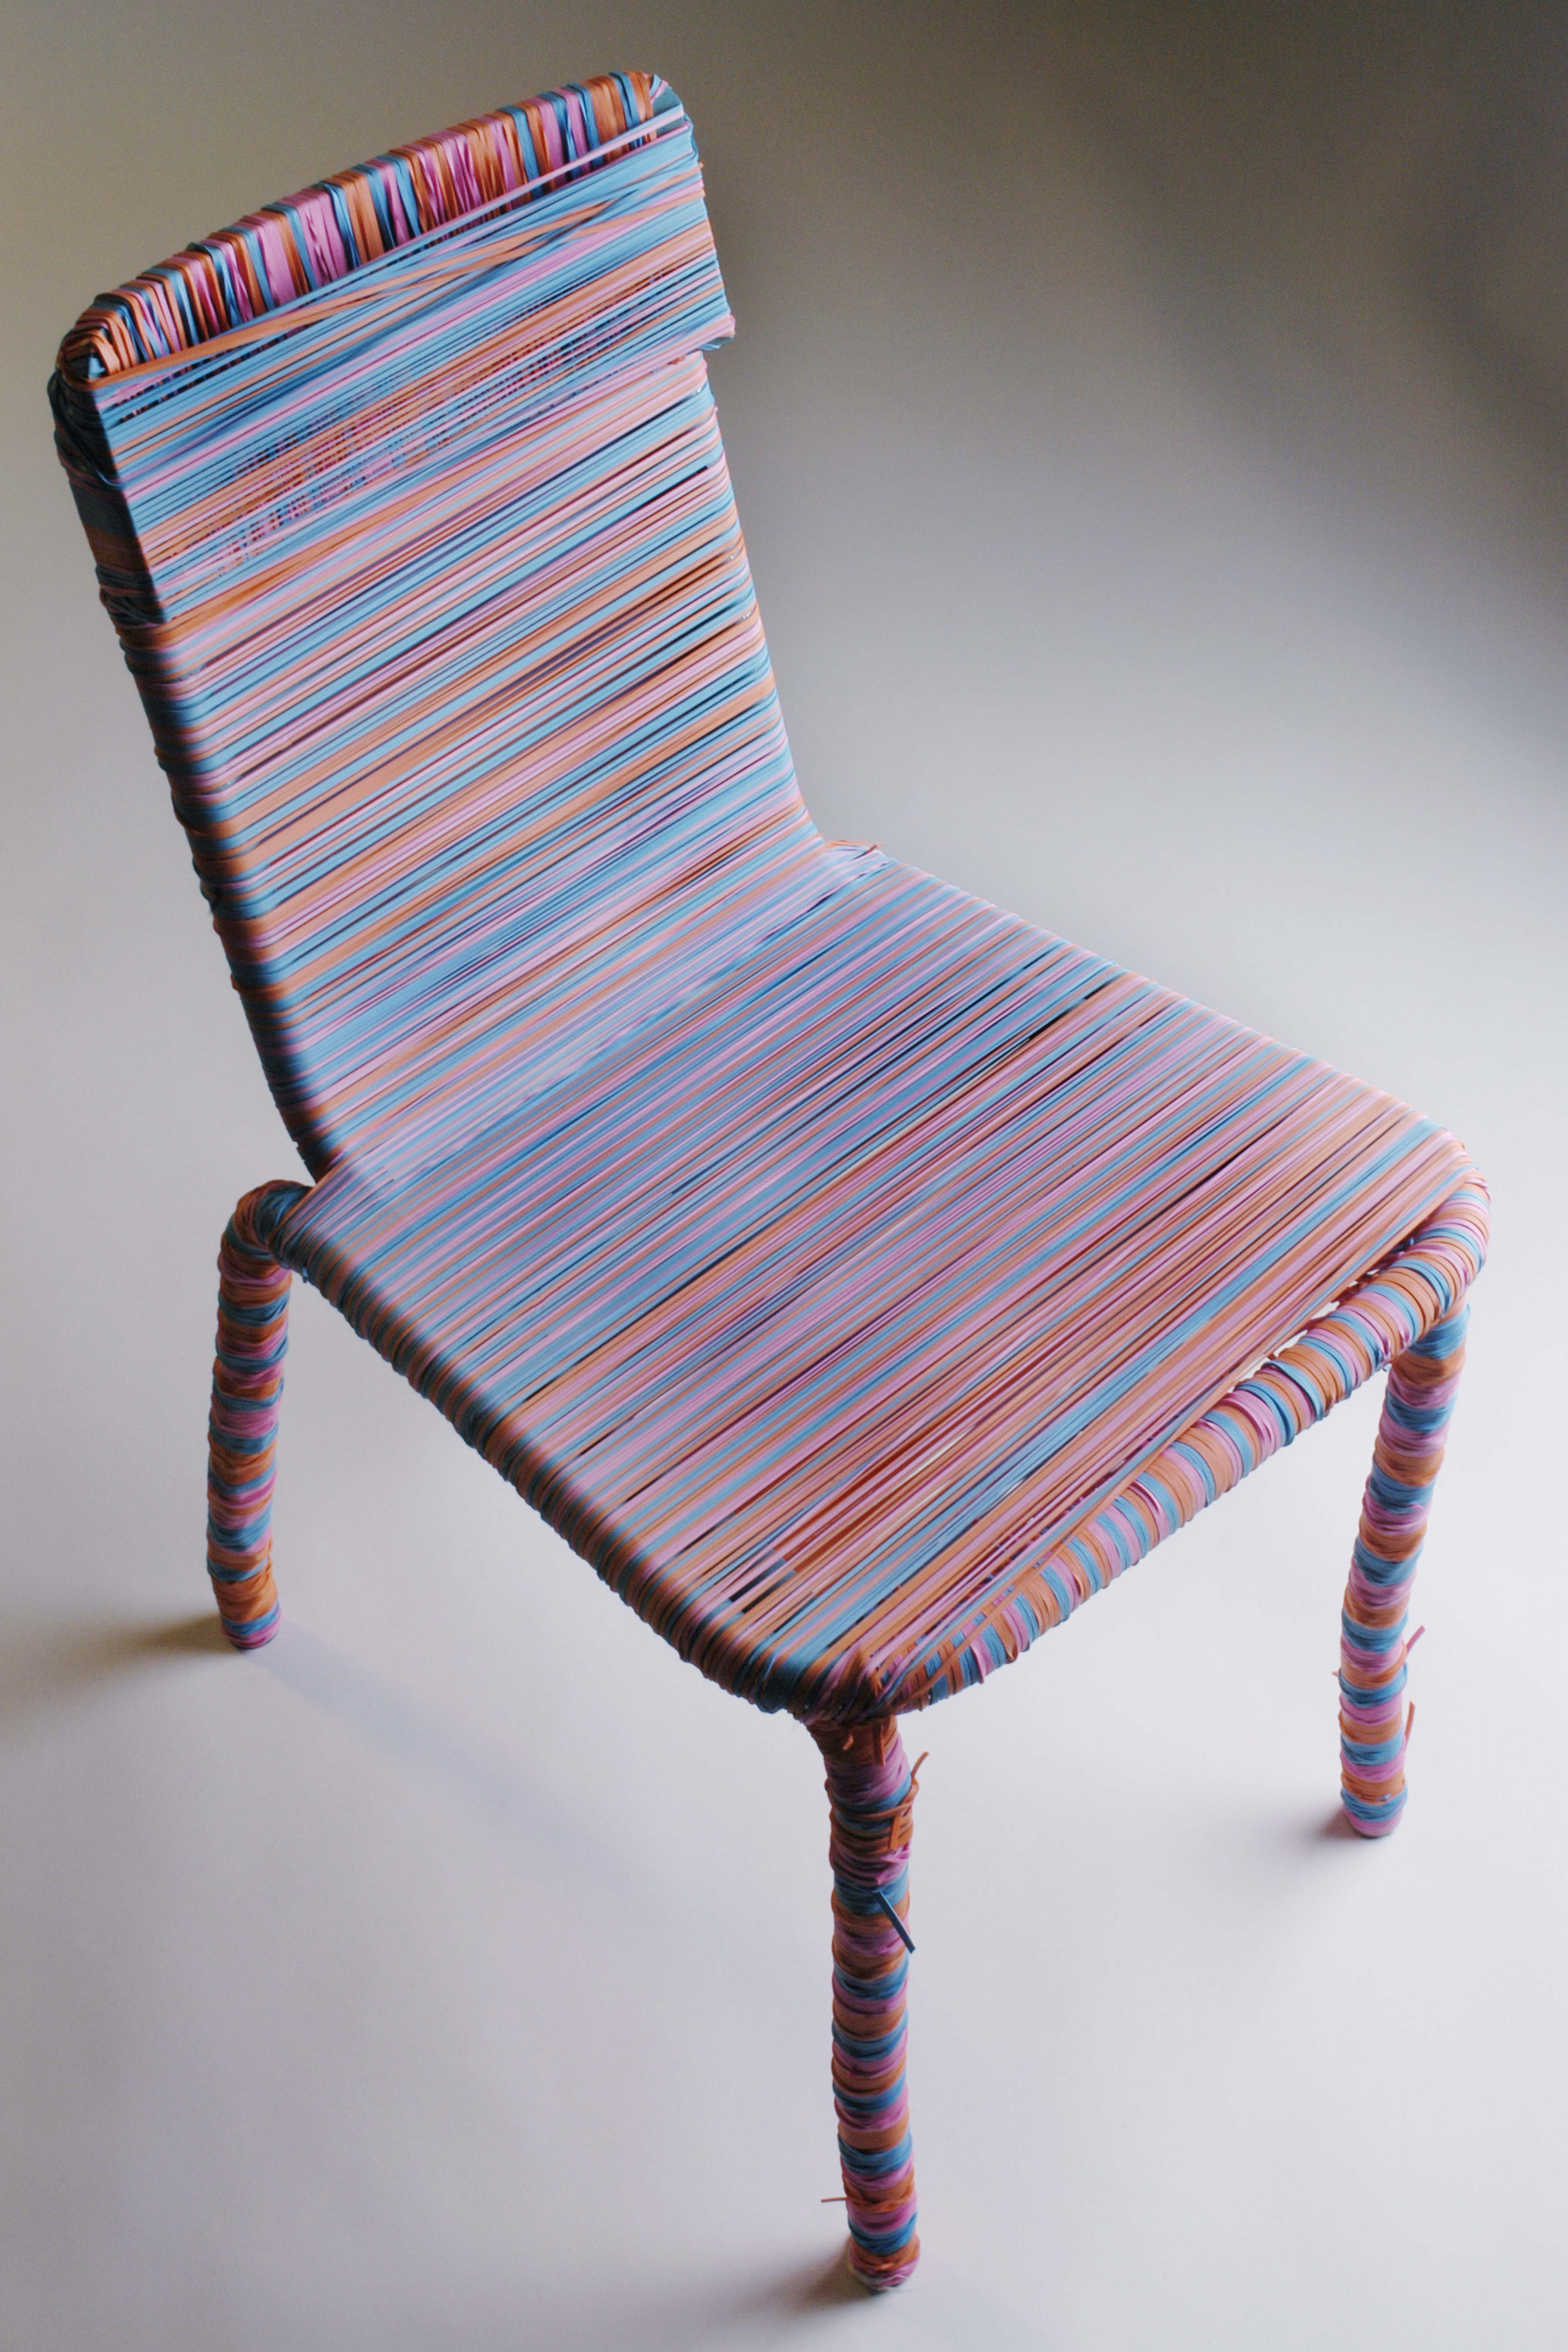 chair experimental design computer amazon harrington project rubberband